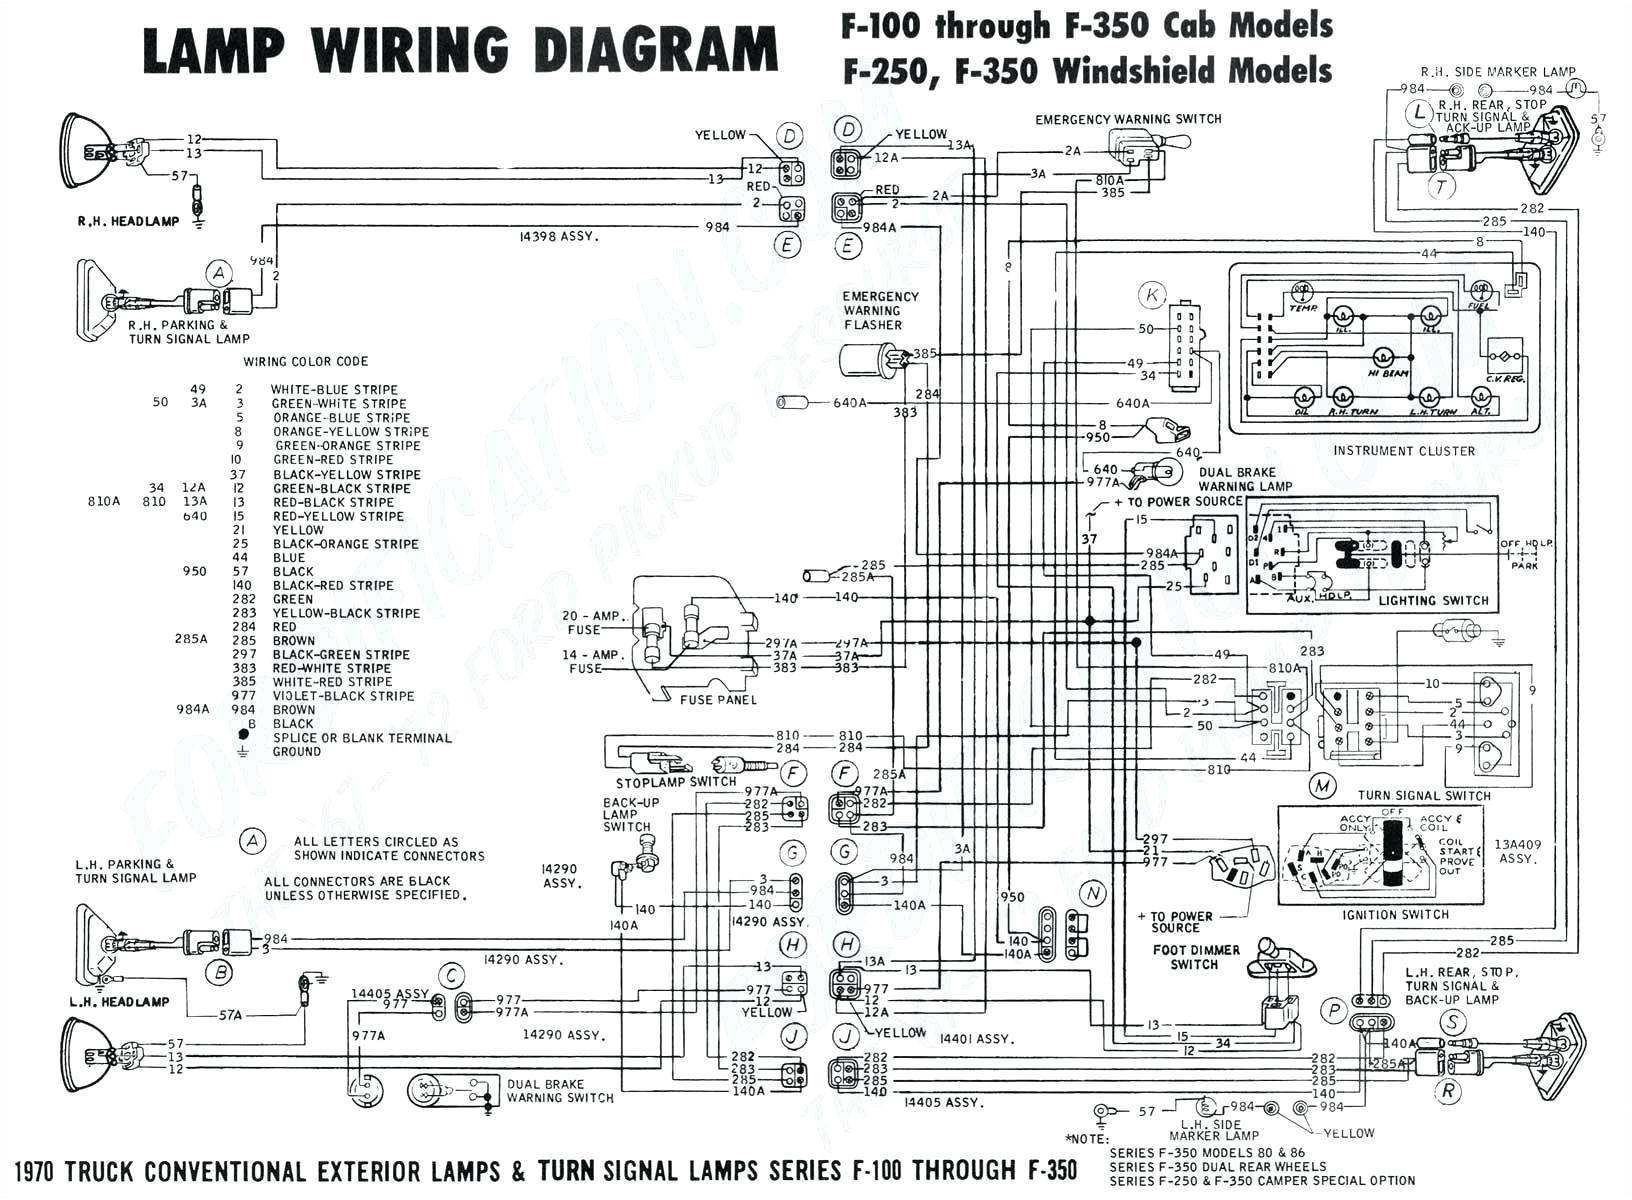 zafira fog light wiring diagram blog wiring diagram vectra c fog light wiring diagram wiring schematic